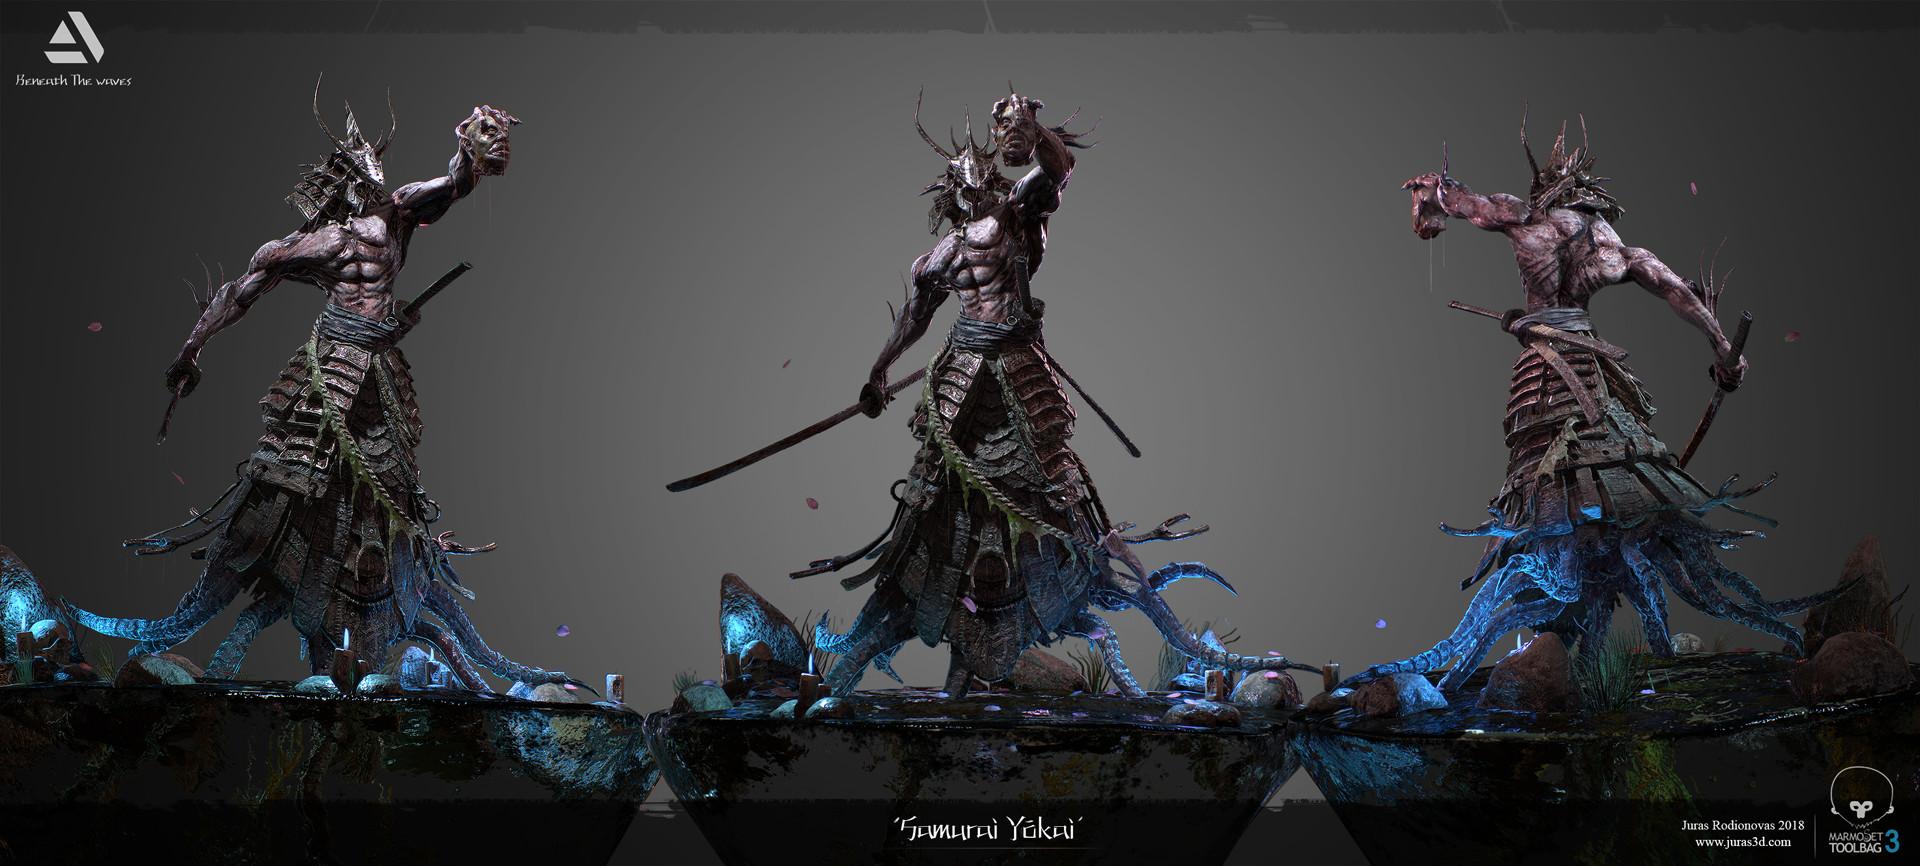 Juras rodionovas samurai yokai presentation